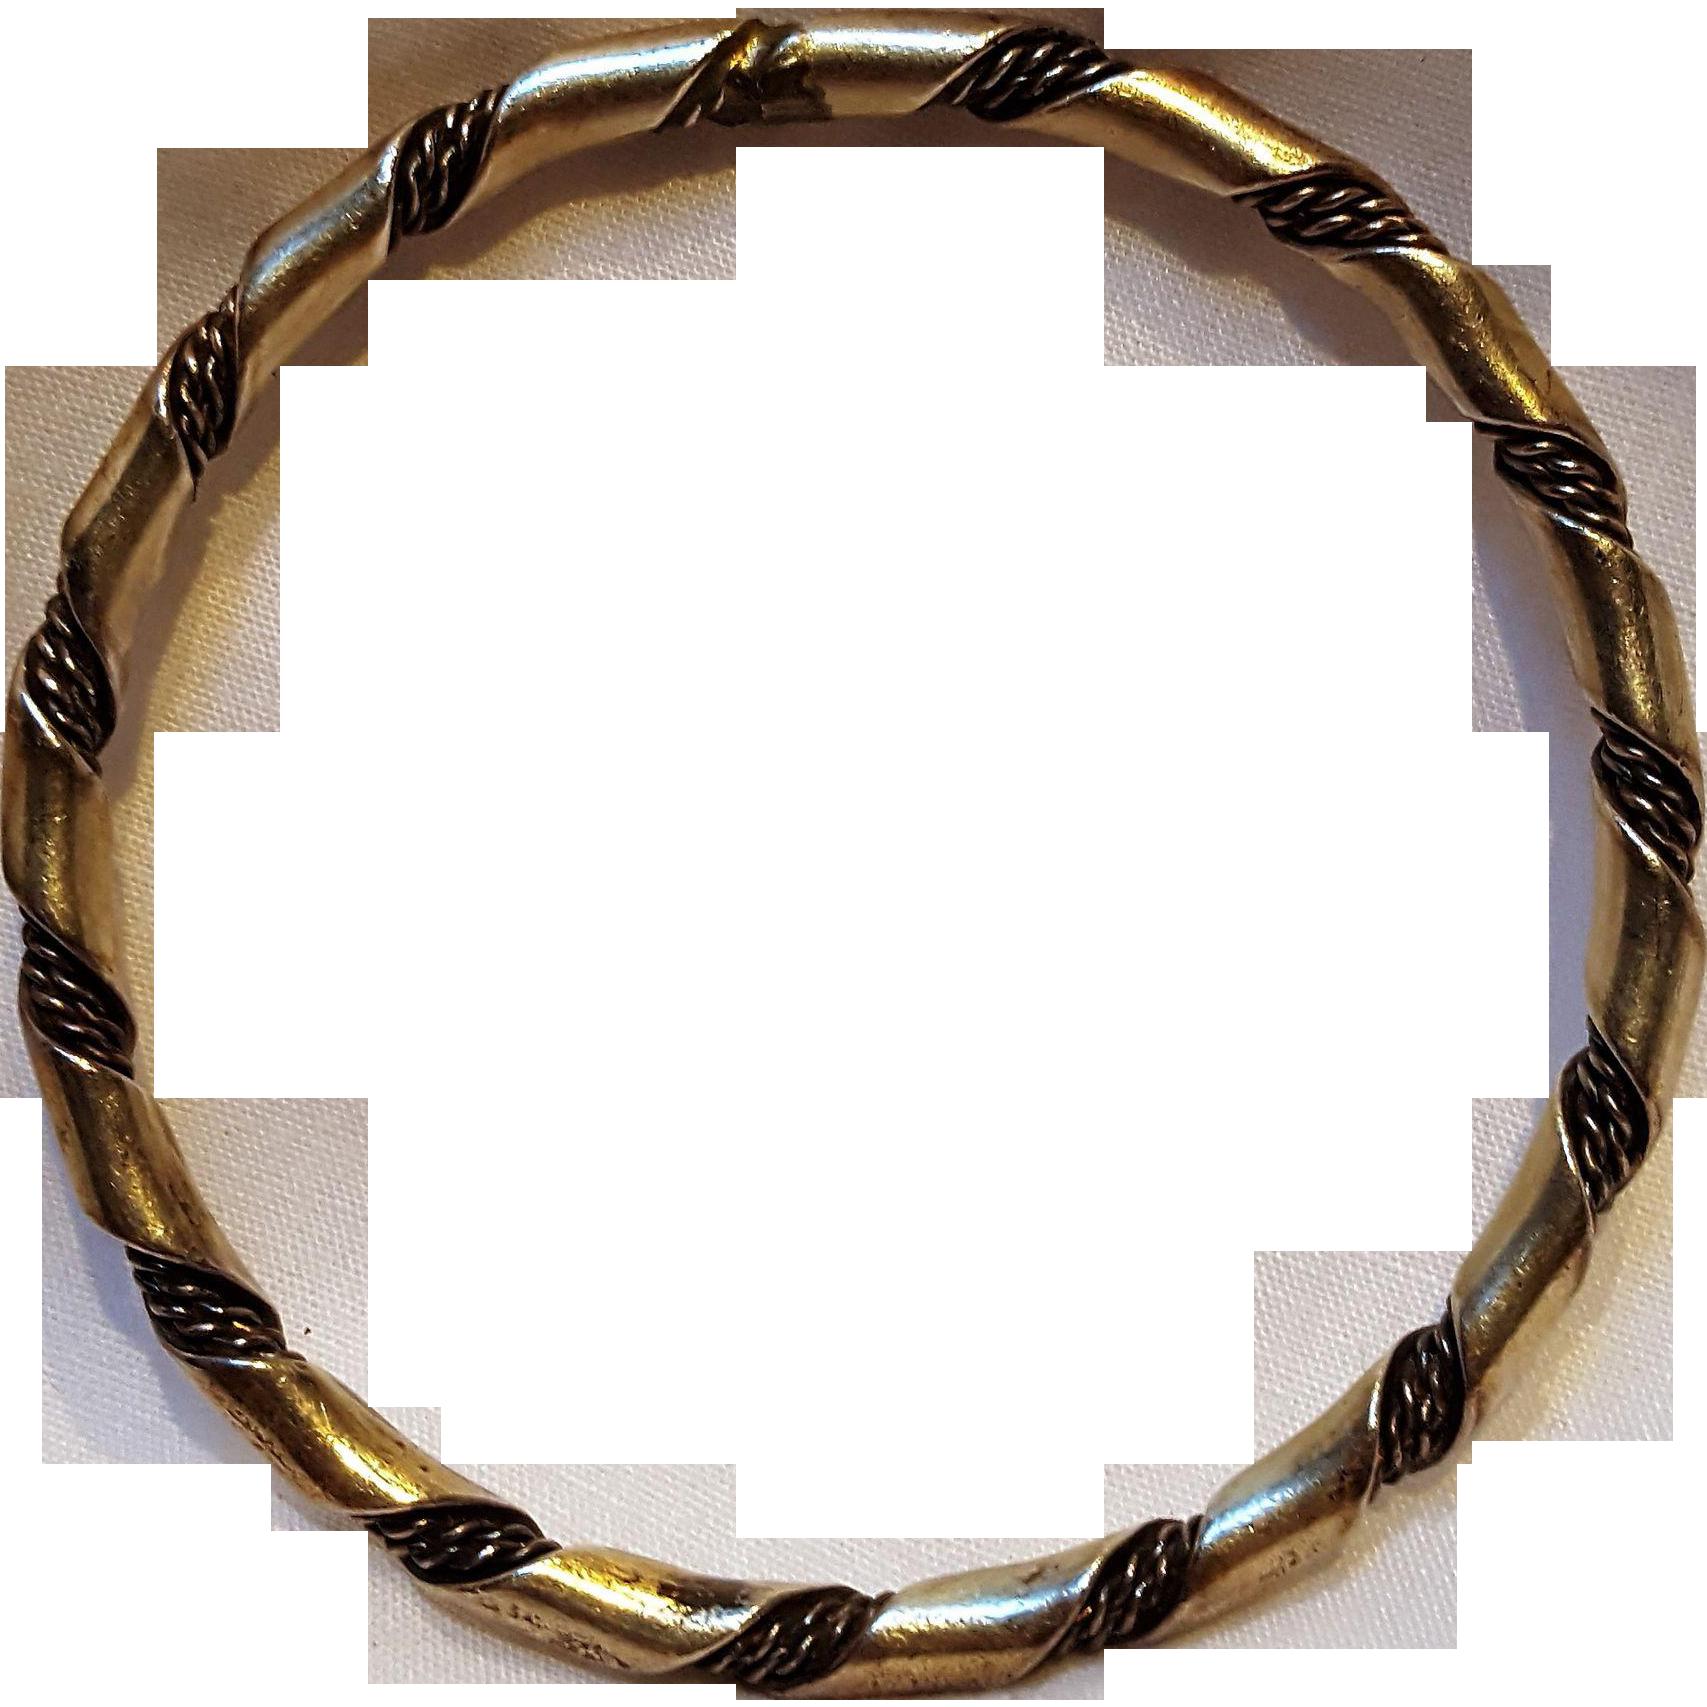 Navajo sterling silver twisted rope ribbon bangle bracelet